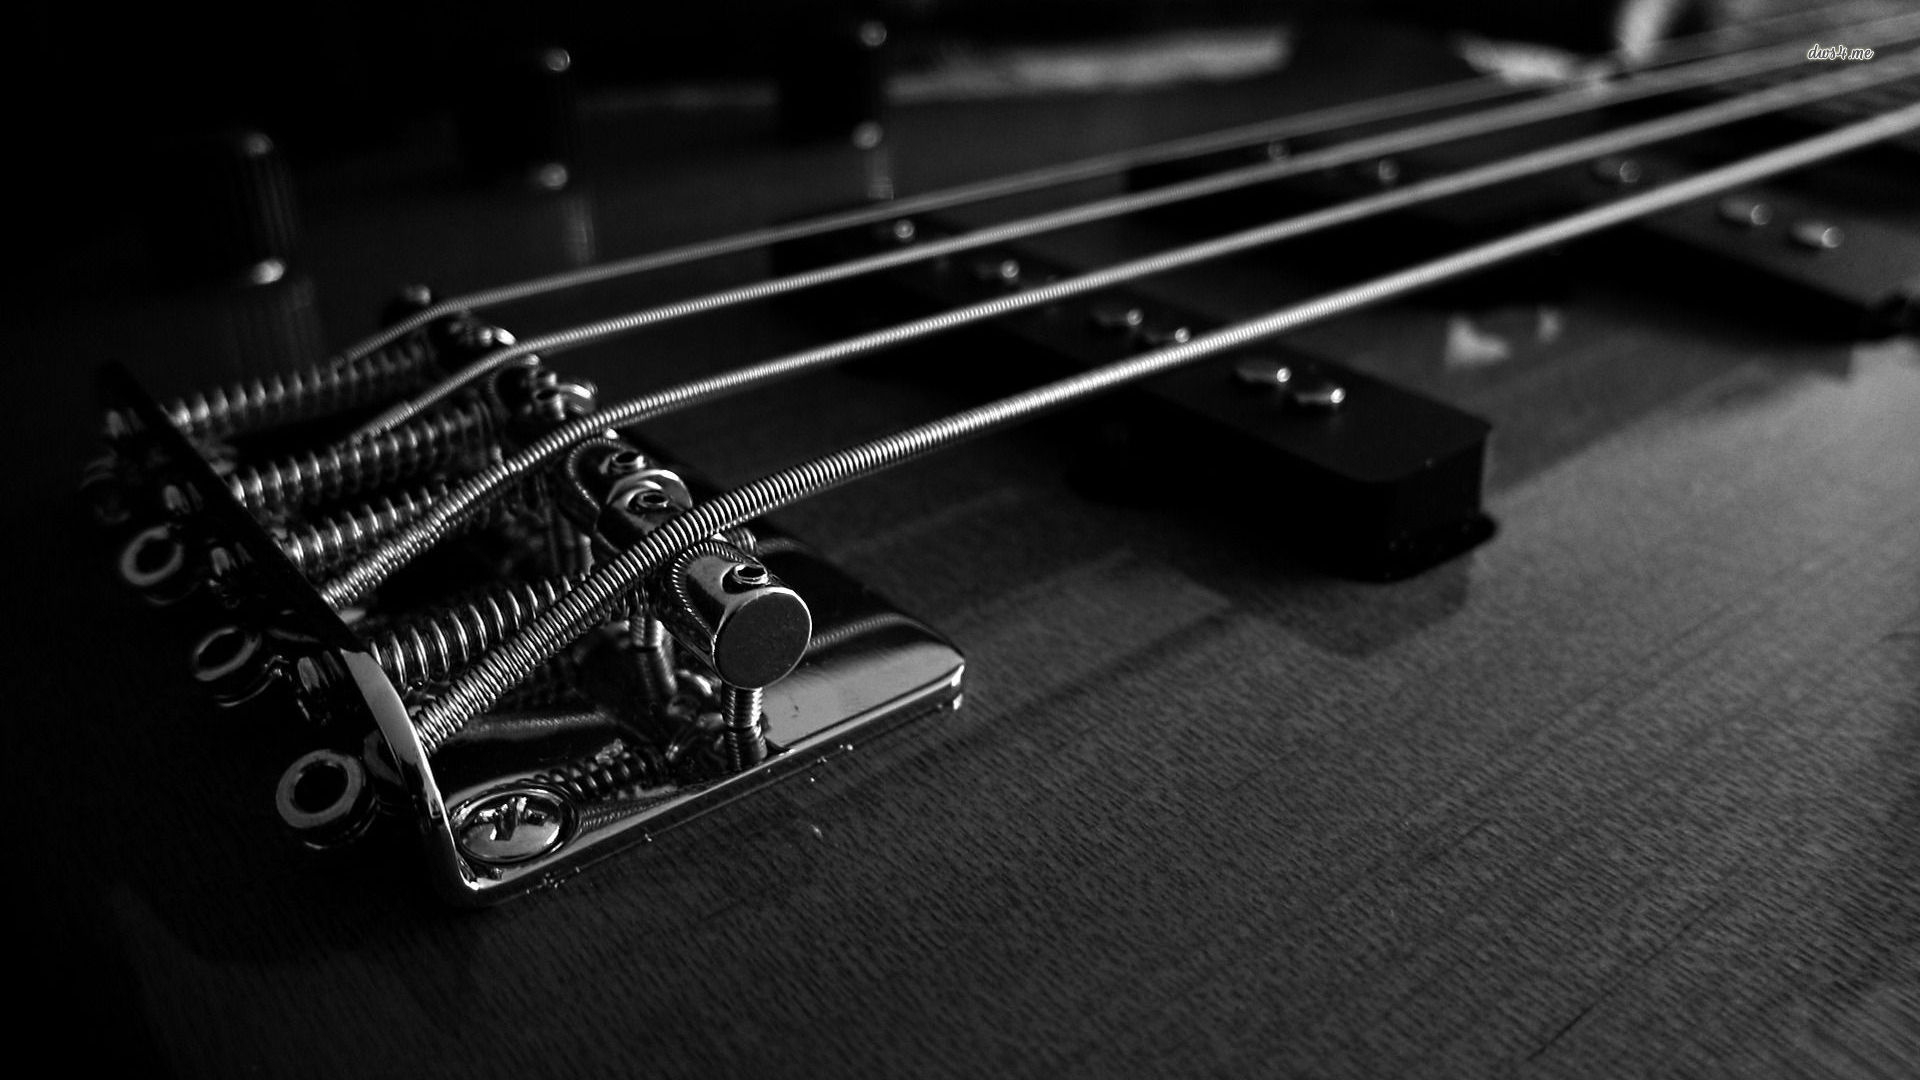 Music Guitar Wallpapers Hd Desktop And Mobile Backgrounds: HD Bass Guitar Wallpaper